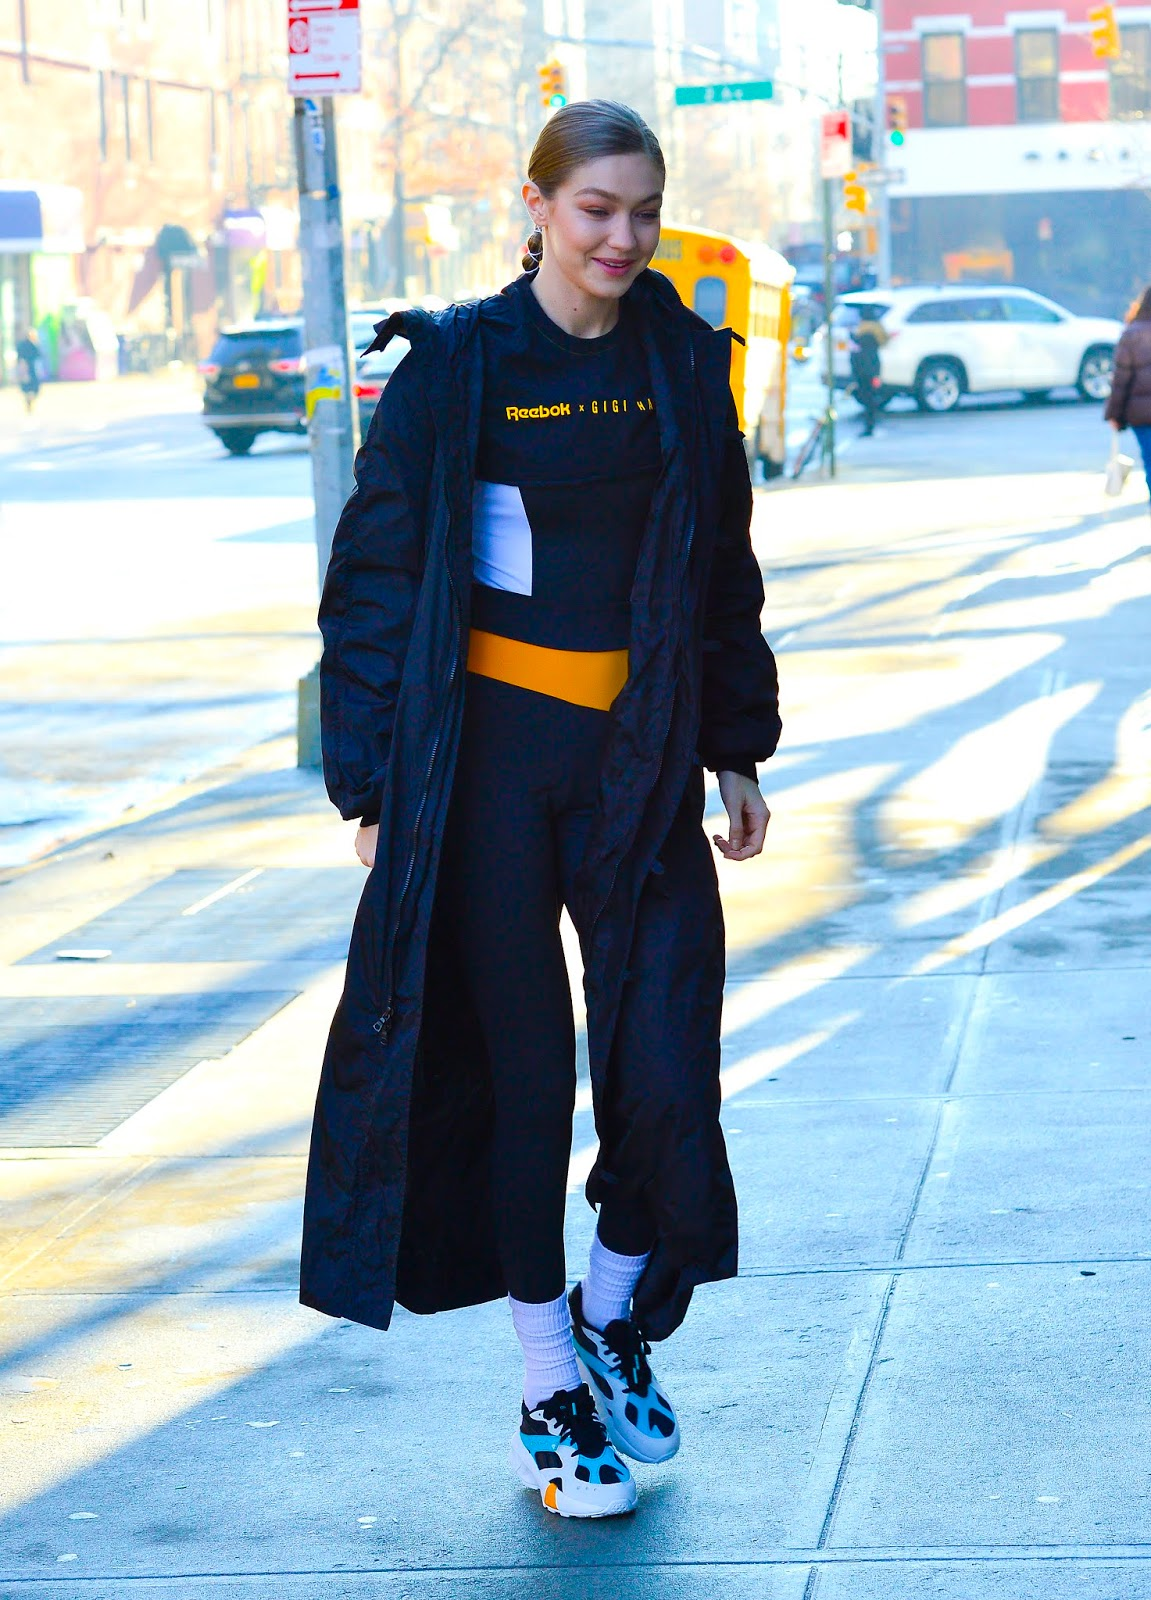 Gigi Hadid visiting a school in NYC - 02/04/2019